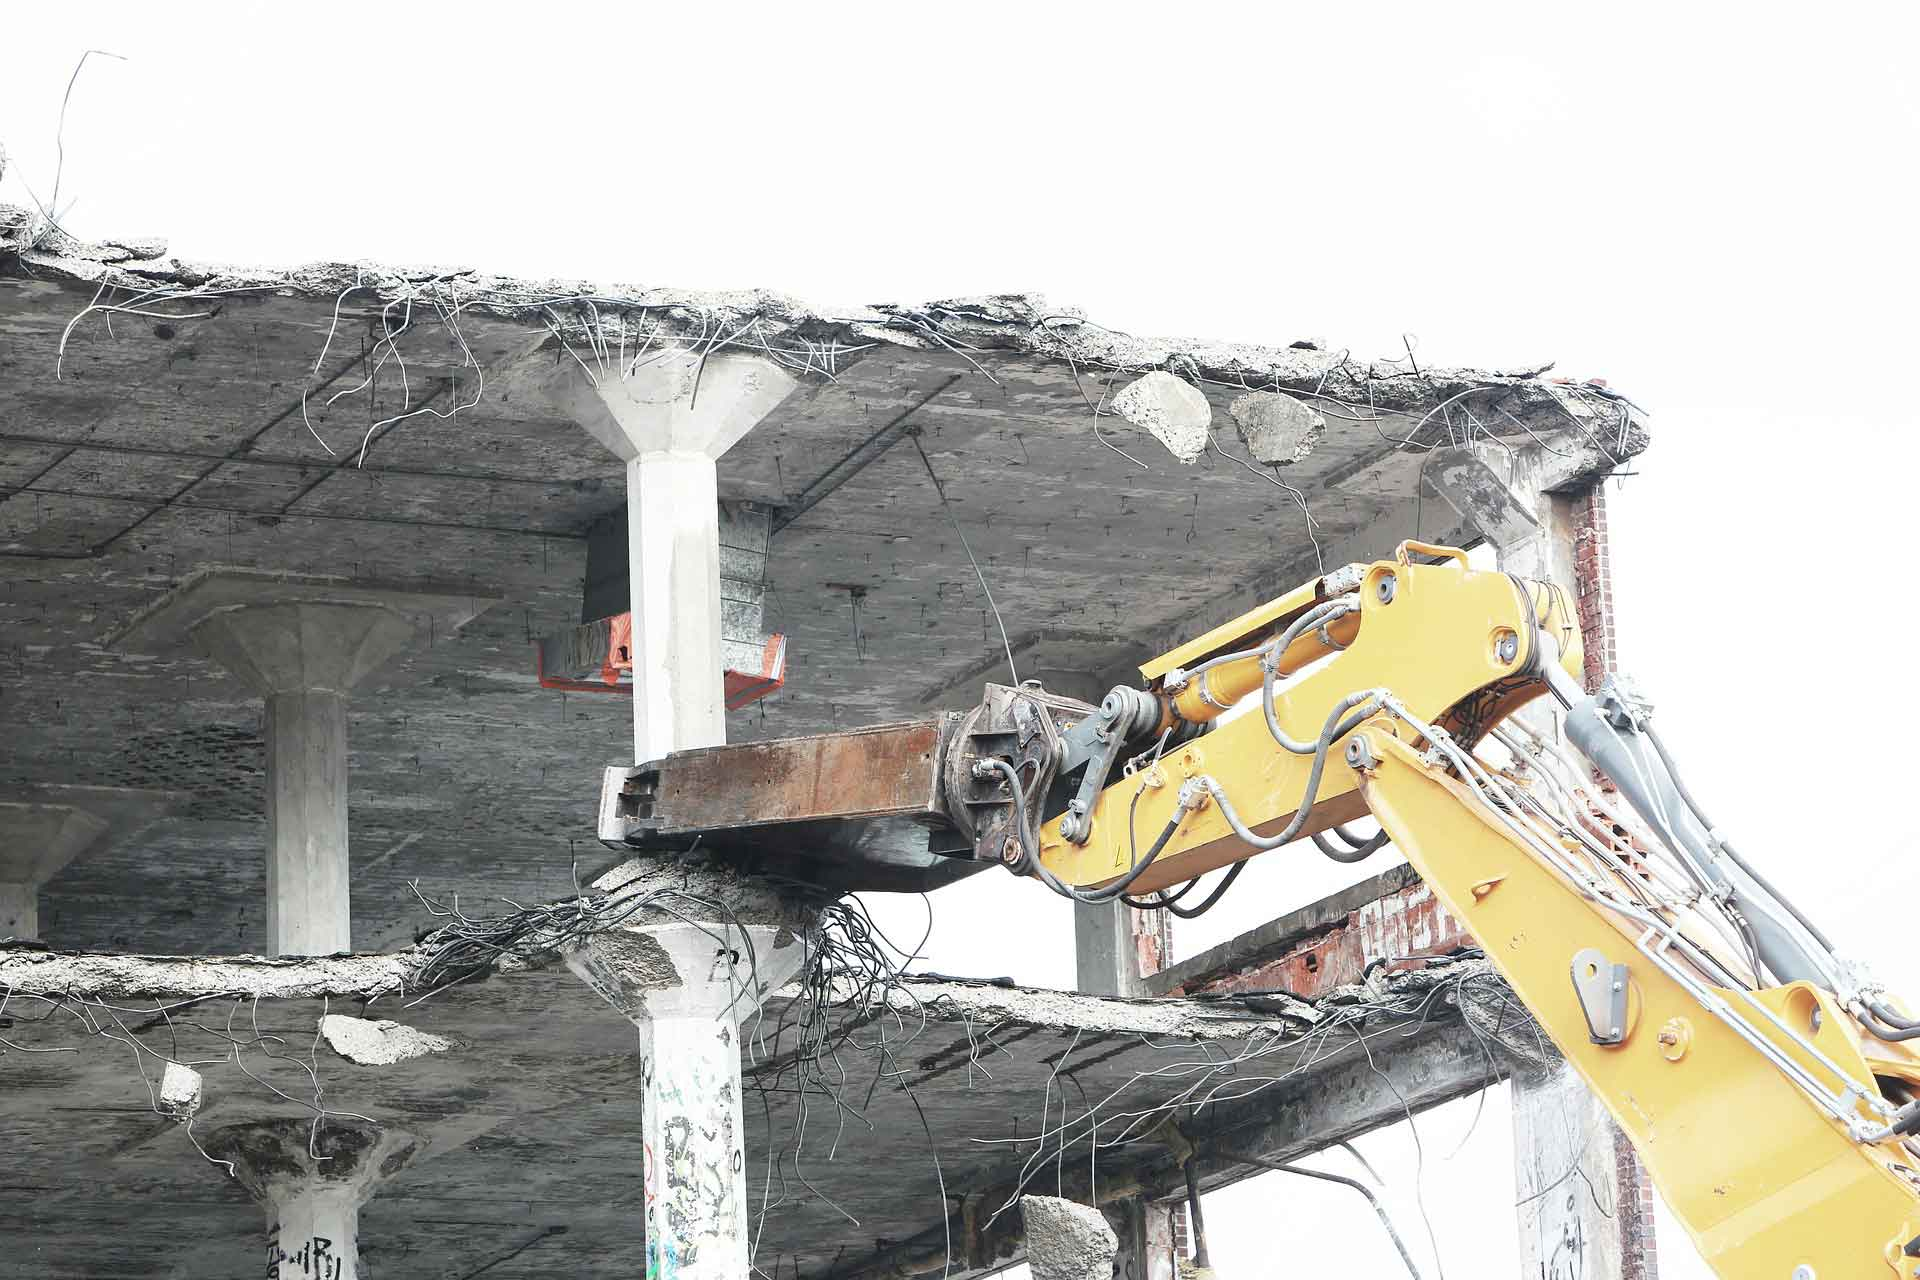 Dismantling of buildings, pipelines, equipment